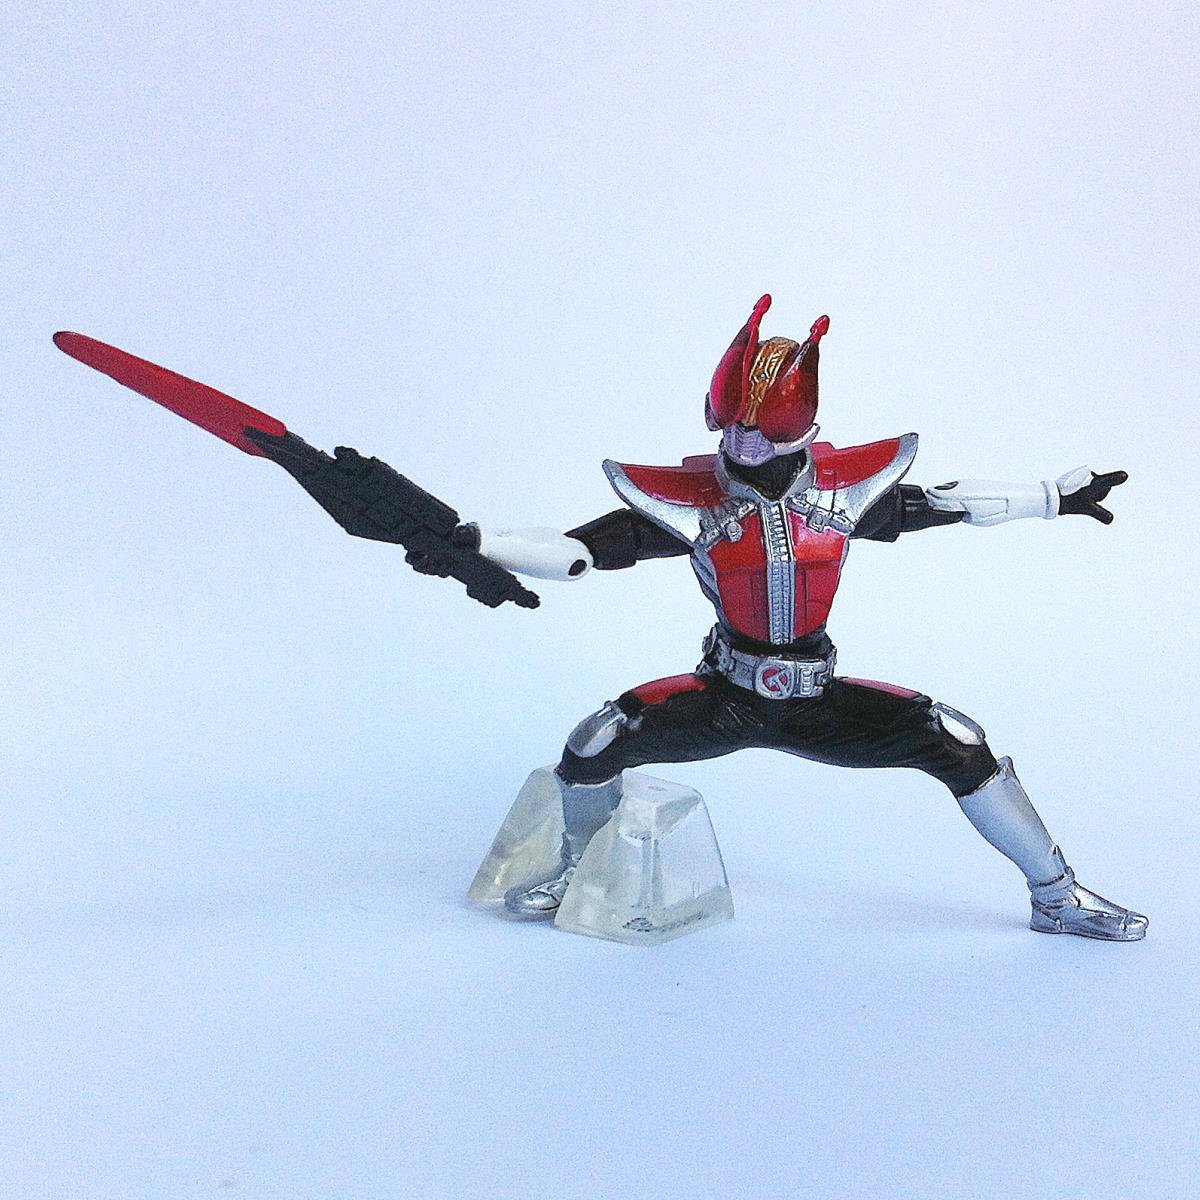 Kamen Rider Den-O Sword Form from Kamen Rider Action Pose by Bandai